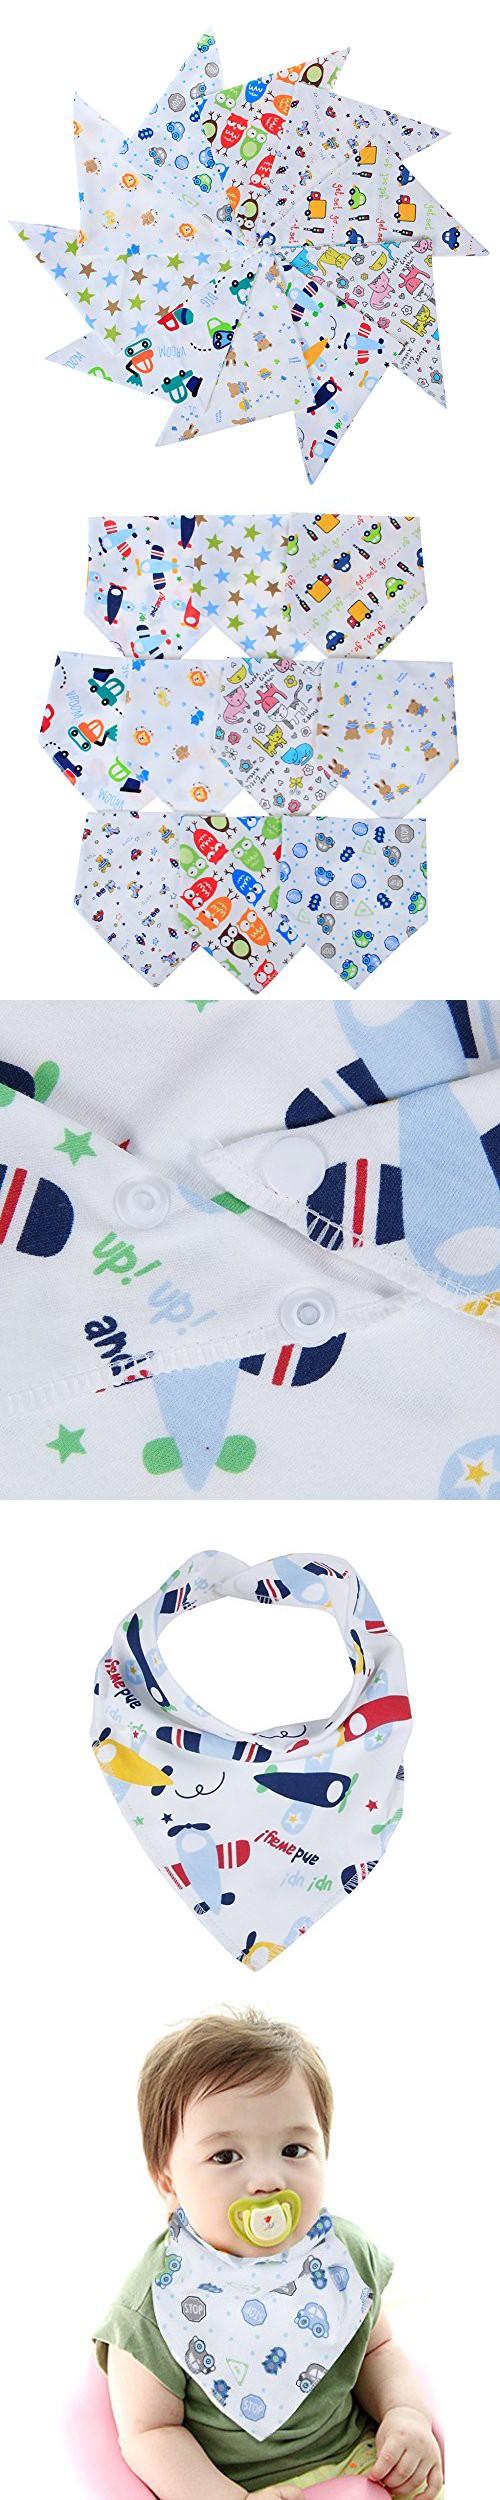 Labebe Baby Bandana Bibs Drool Burpy Bibs For Boys 10 Pack